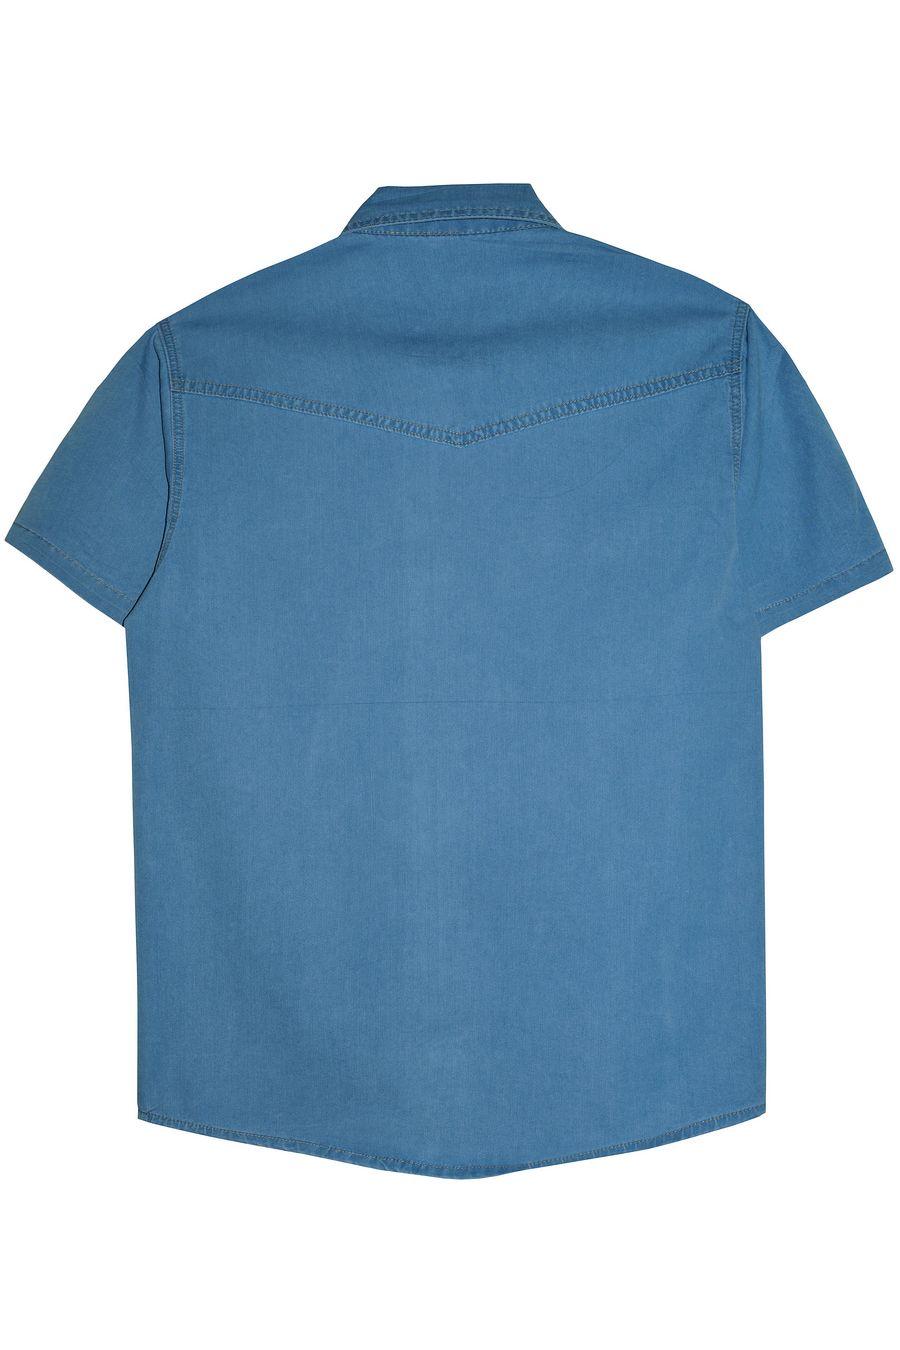 Рубашка мужская Vicucs 728E/CT-321-21 (XL-5XL) - фото 2